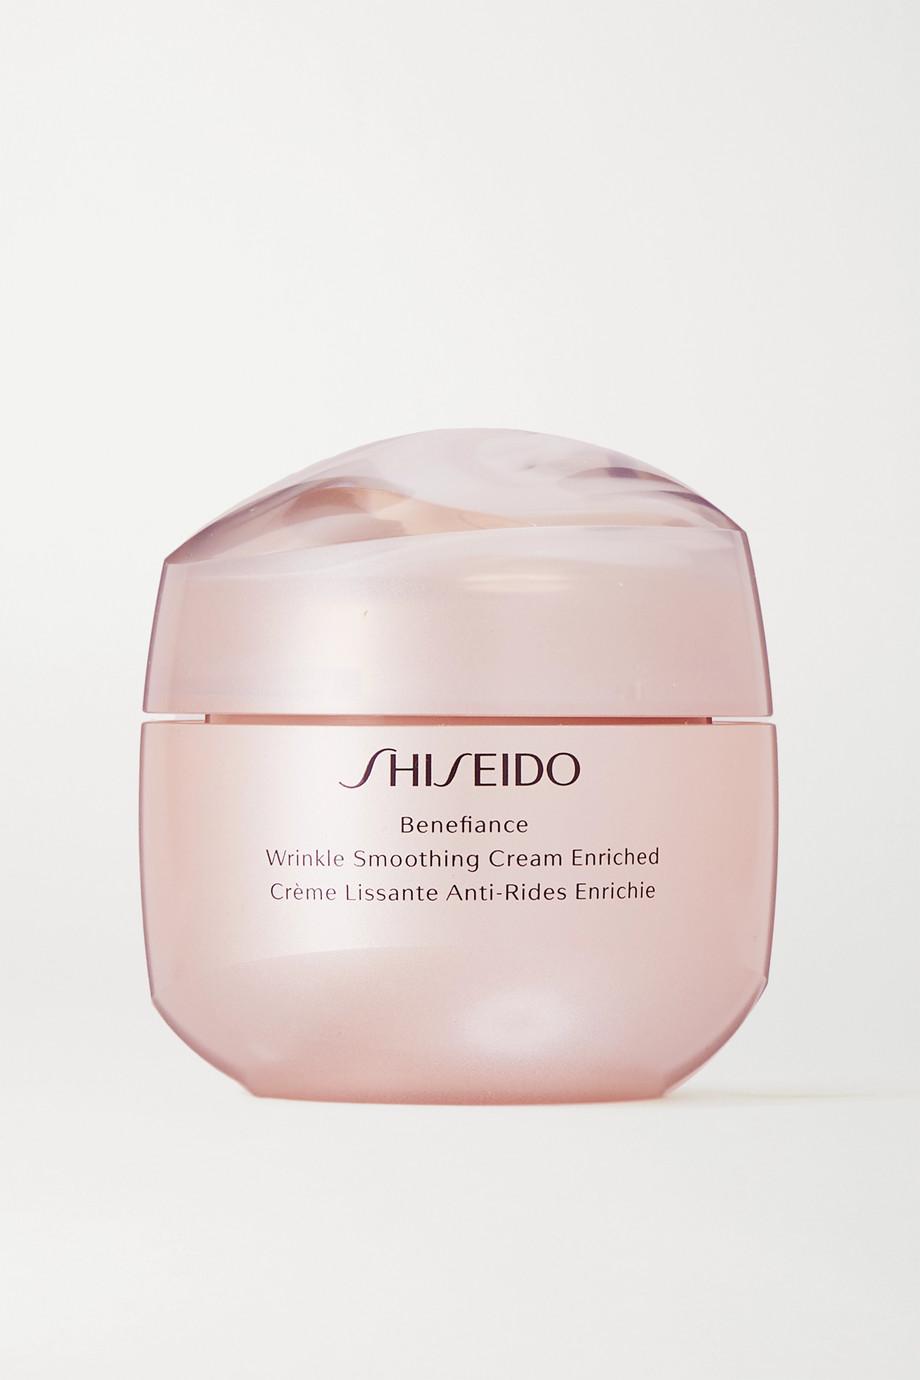 Shiseido Benefiance Wrinkle Smoothing Cream Enriched, 75 ml – Gesichtscreme